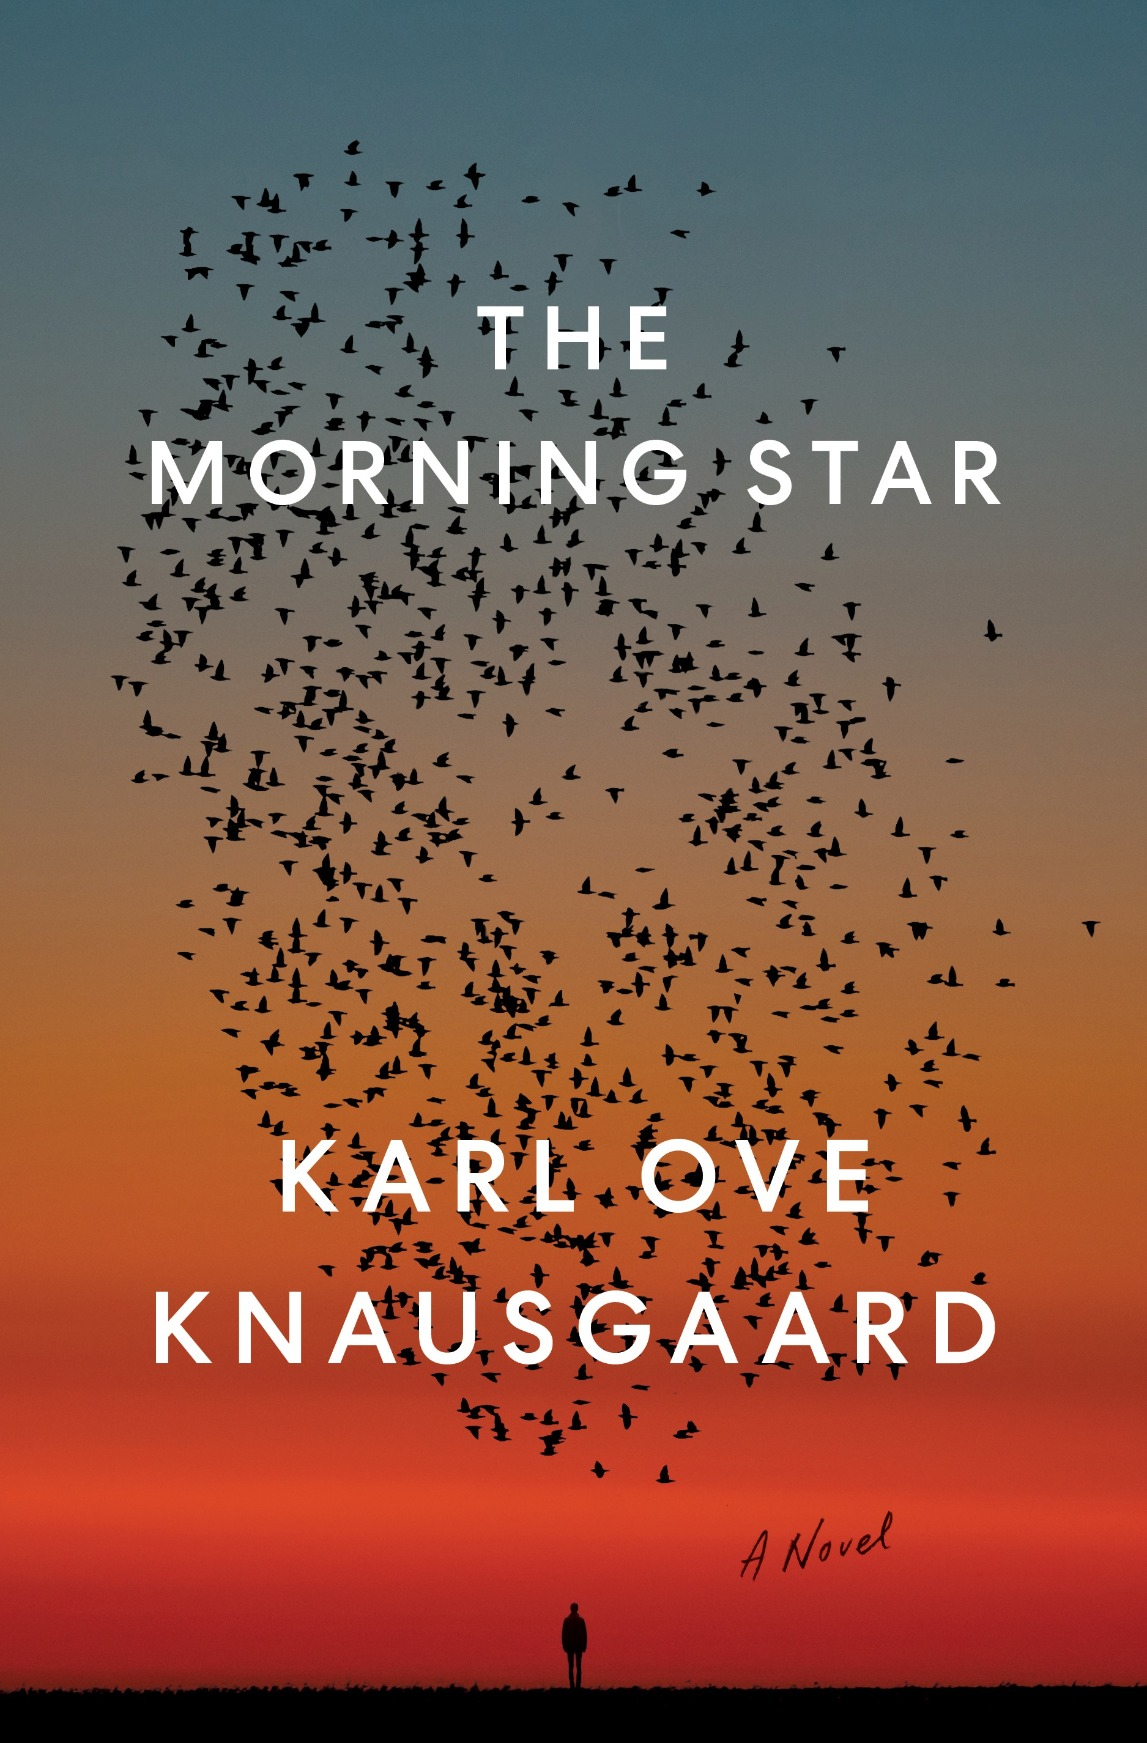 The Revelation According to Knausgaard